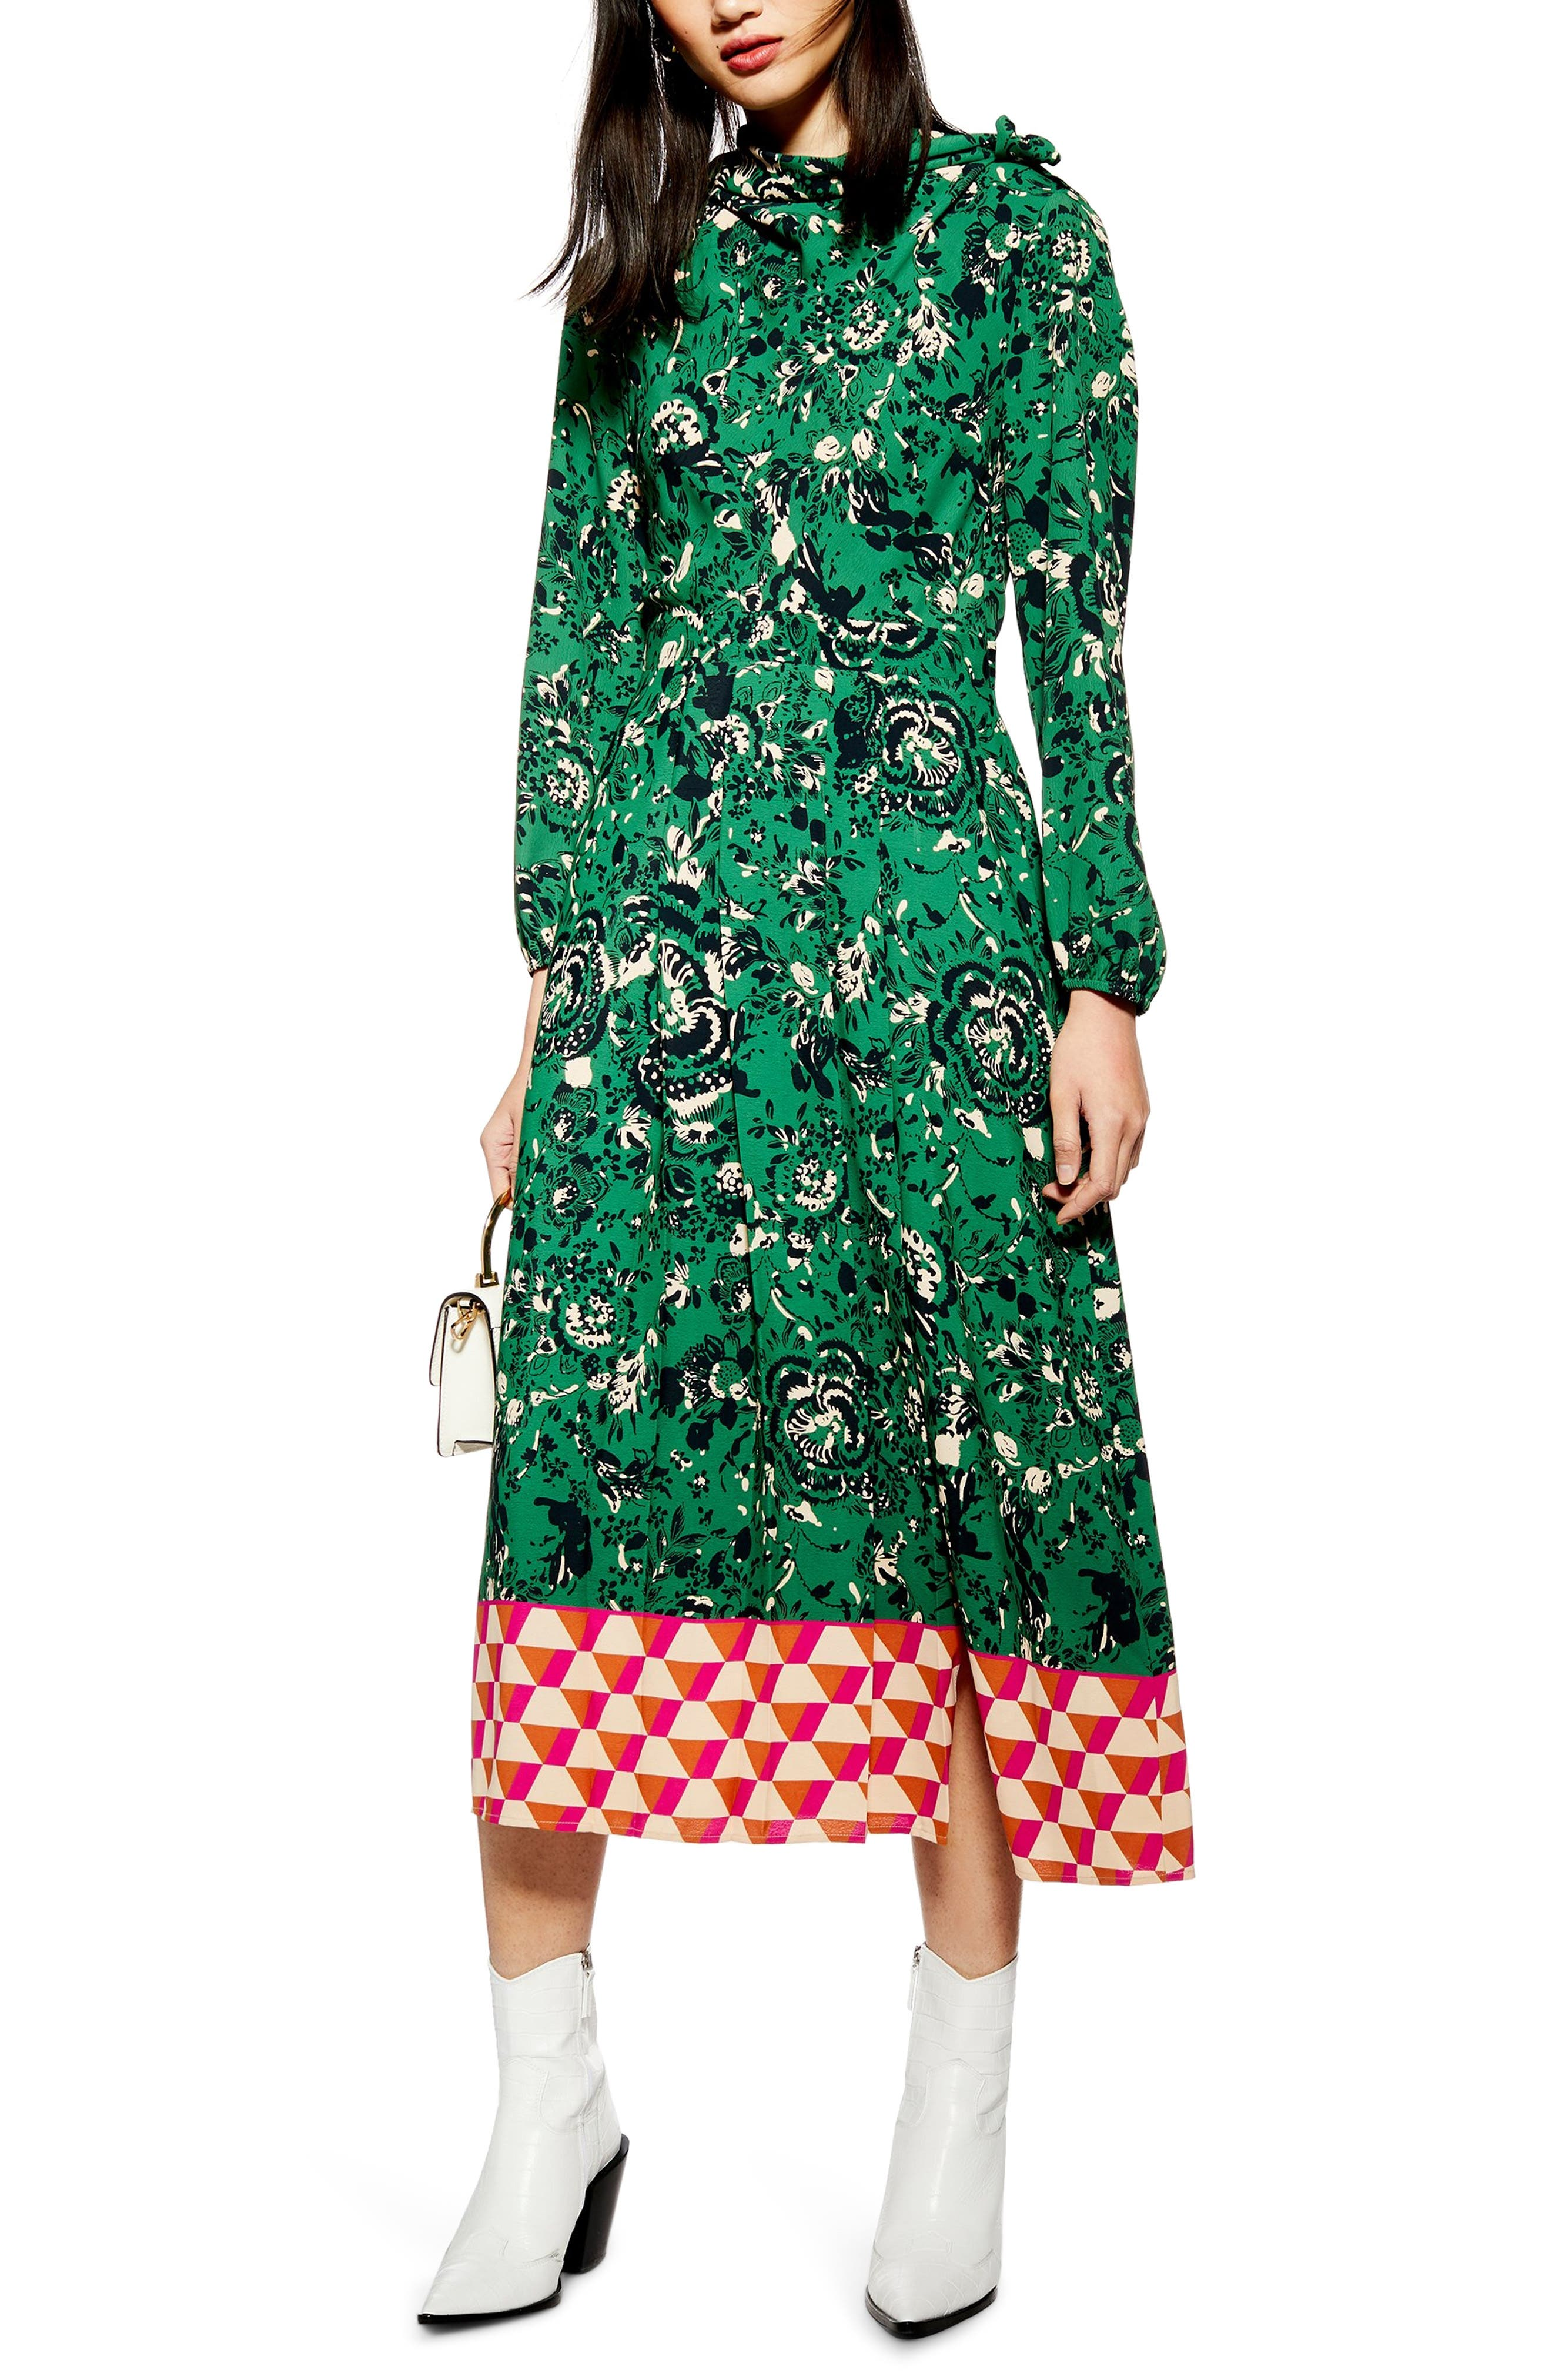 TOPSHOP, Geo Border Tie Neck Midi Dress, Main thumbnail 1, color, GREEN MULTI